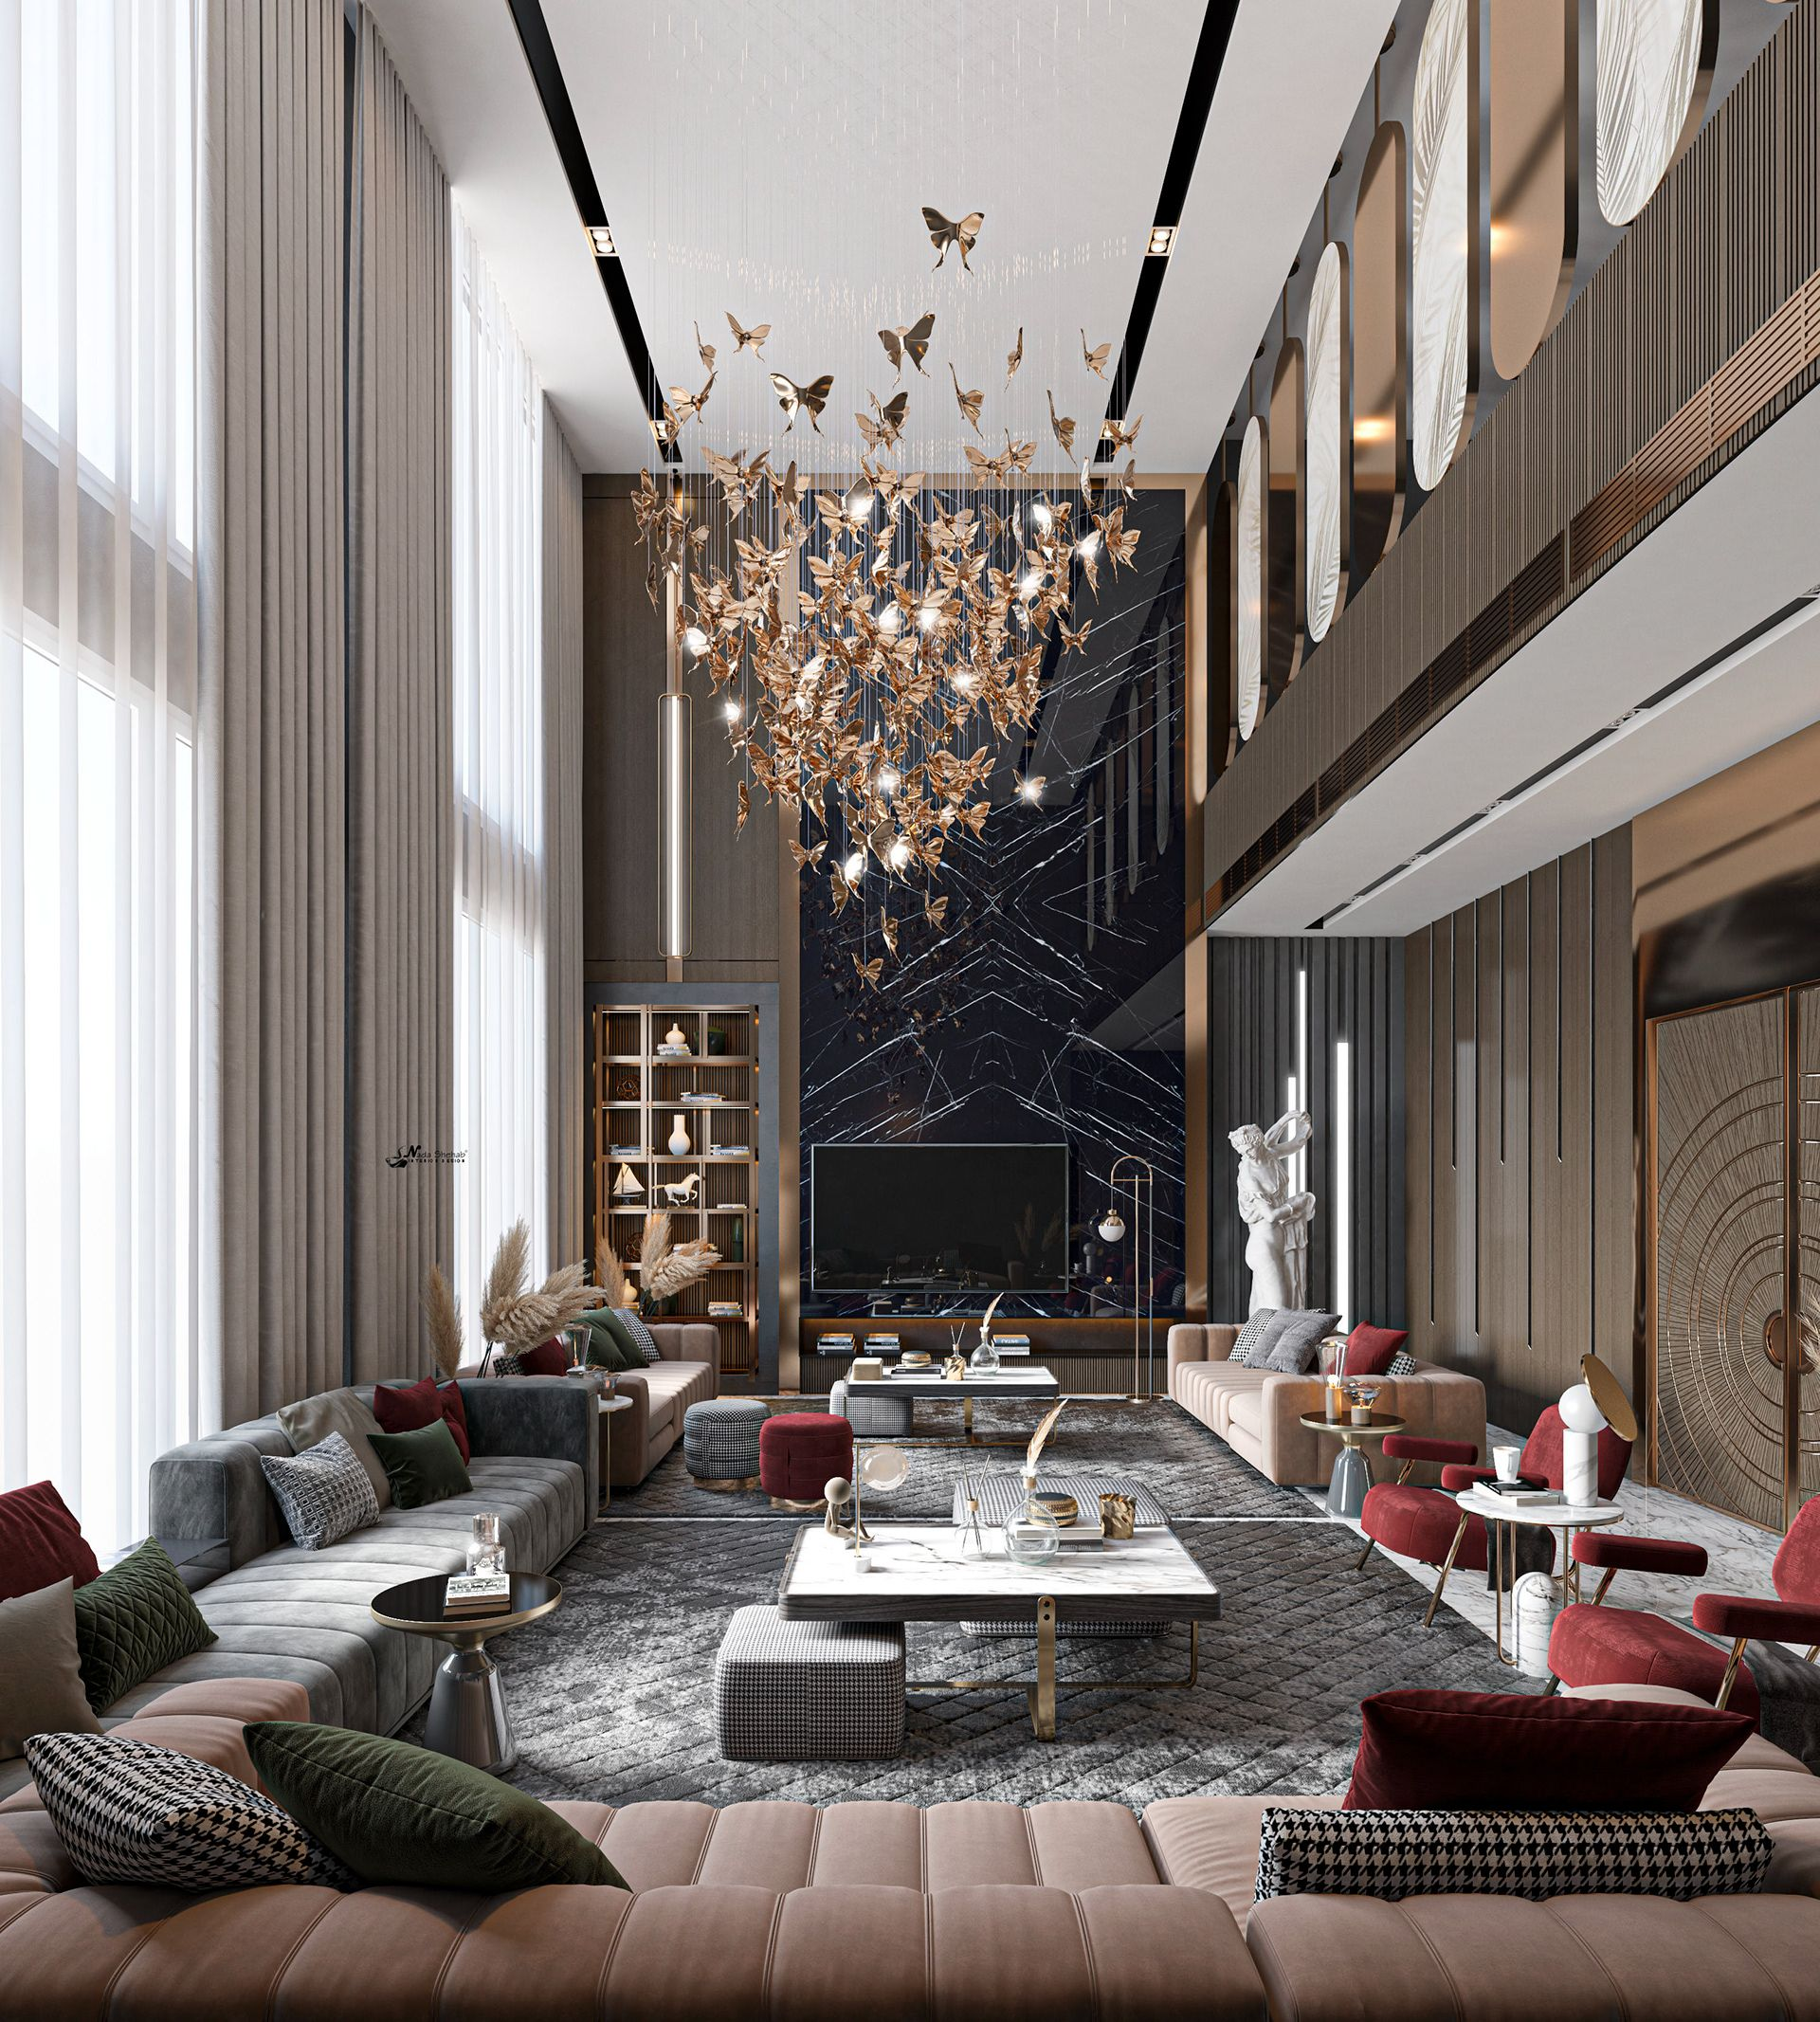 LUXURY DOUBLE HEIGHT on Behance in 2020 | Luxury living ...